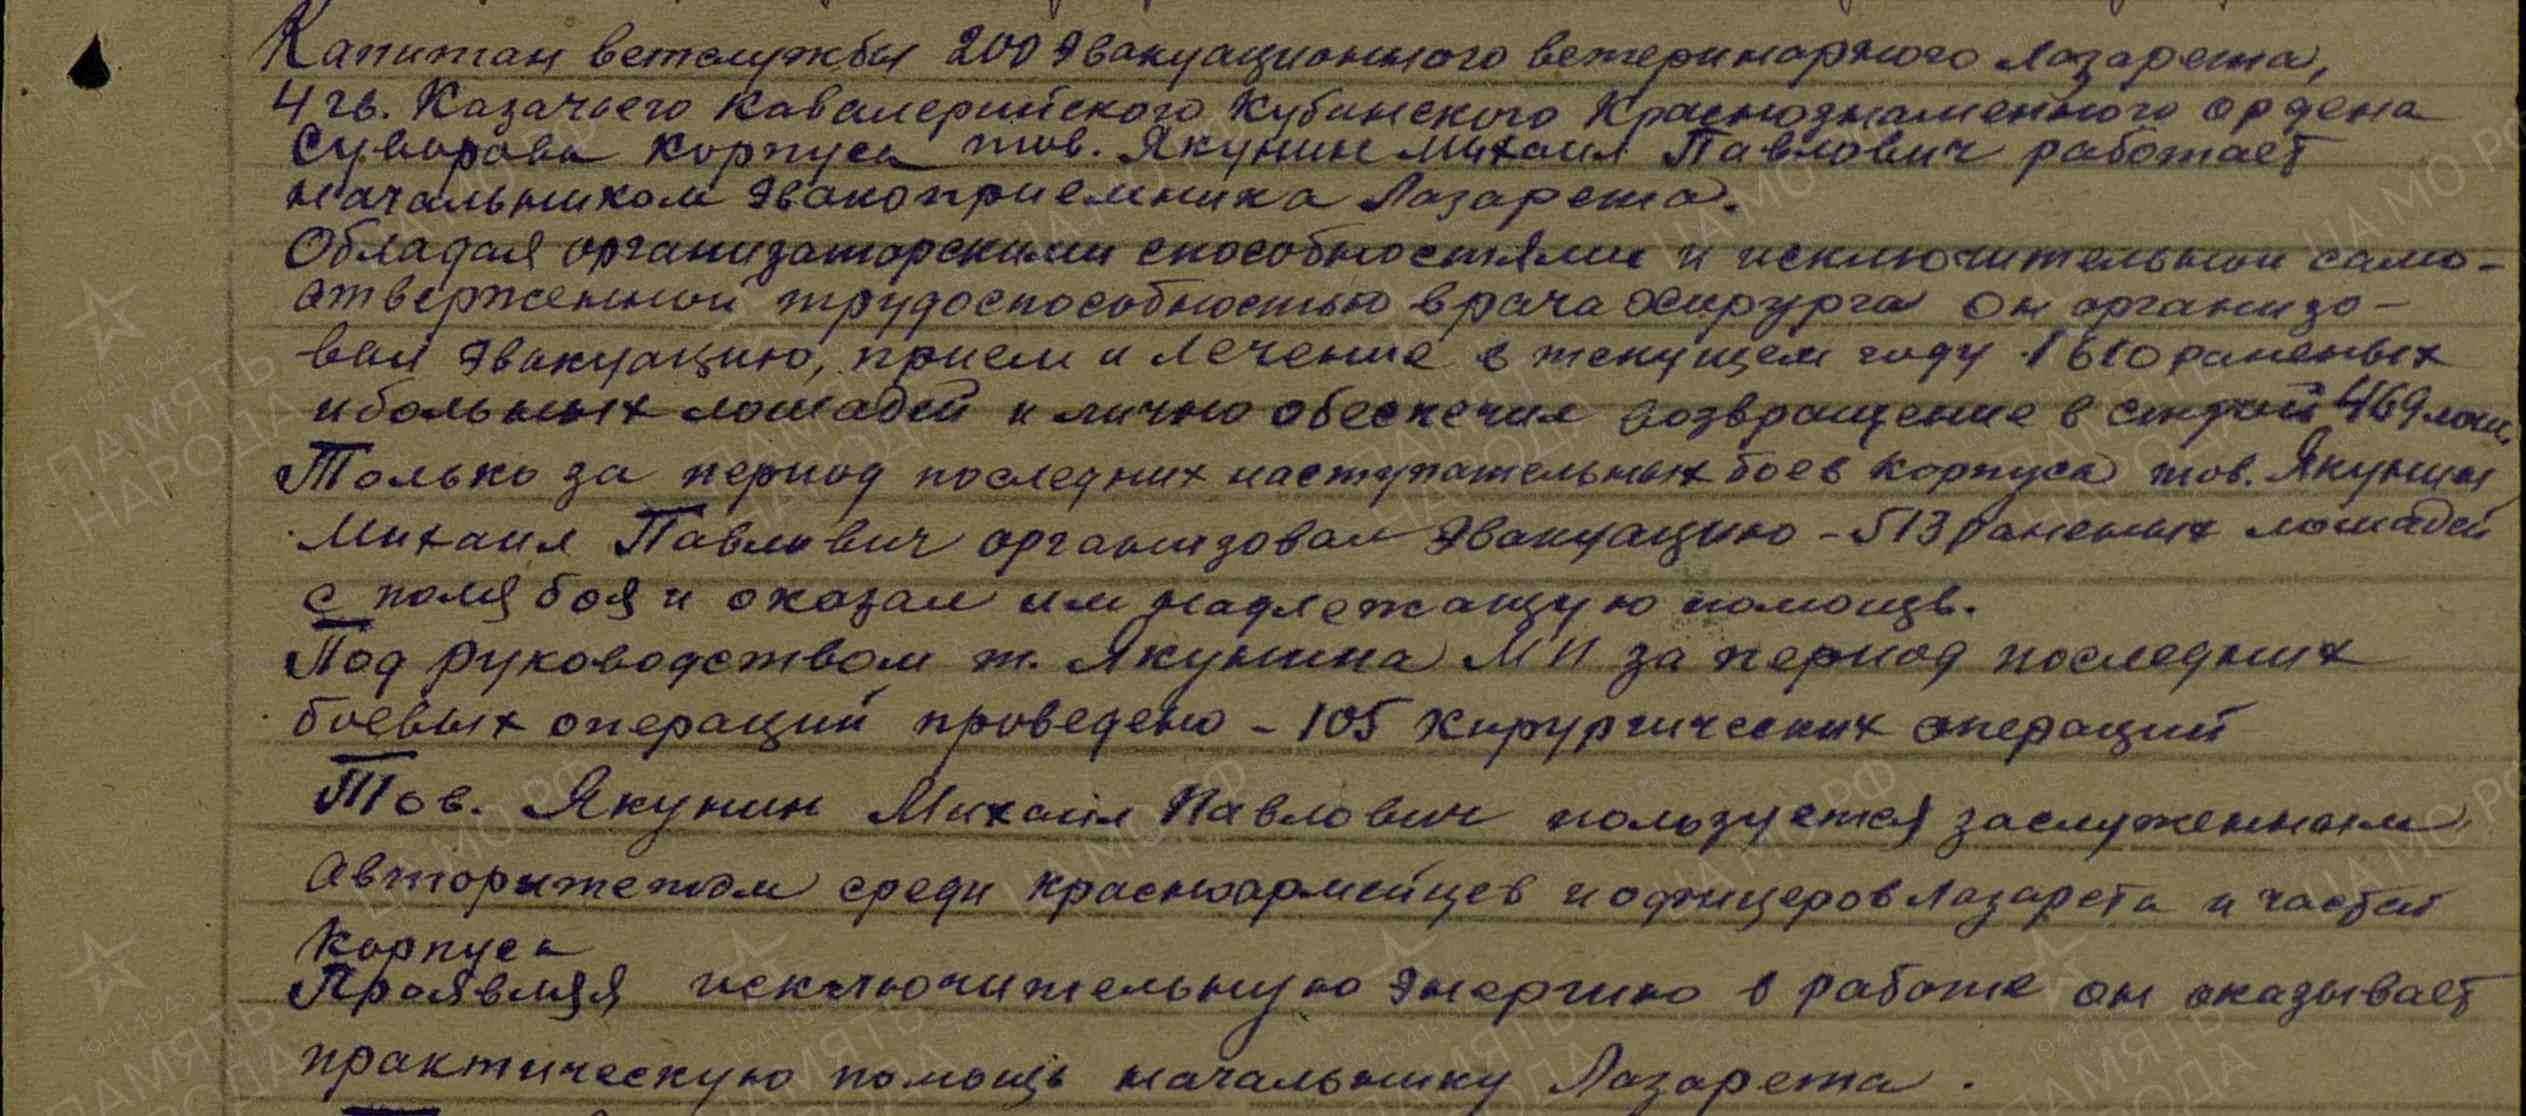 письмо Якунина Михаила Павловича